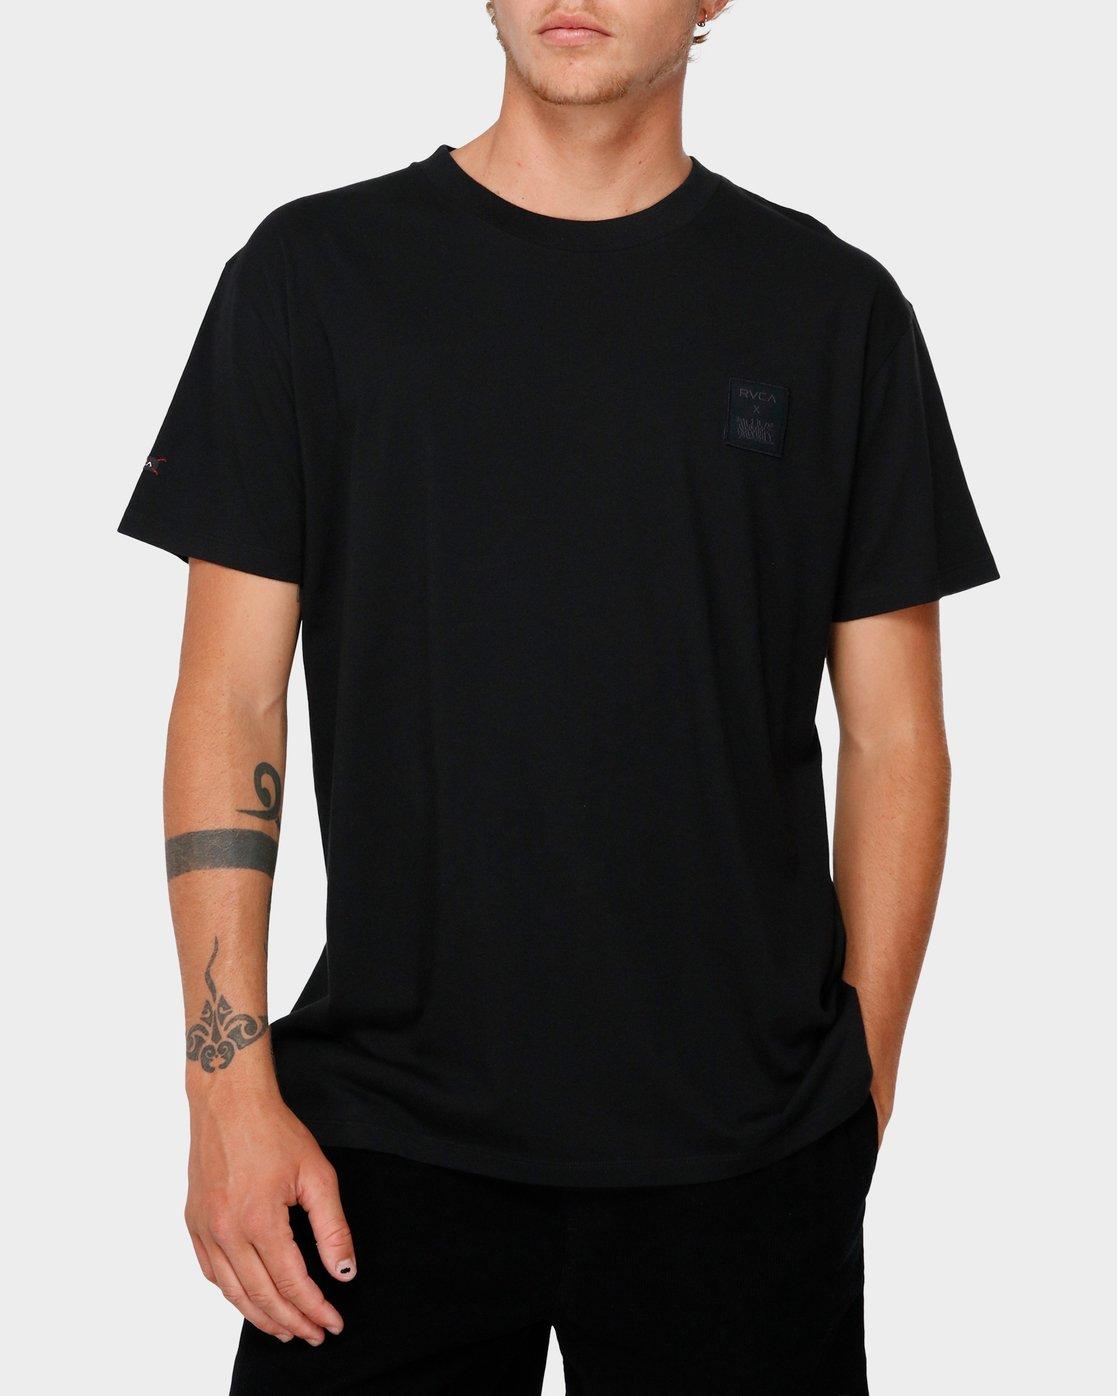 0 RVCA X Highline T-Shirt Black R193066 RVCA